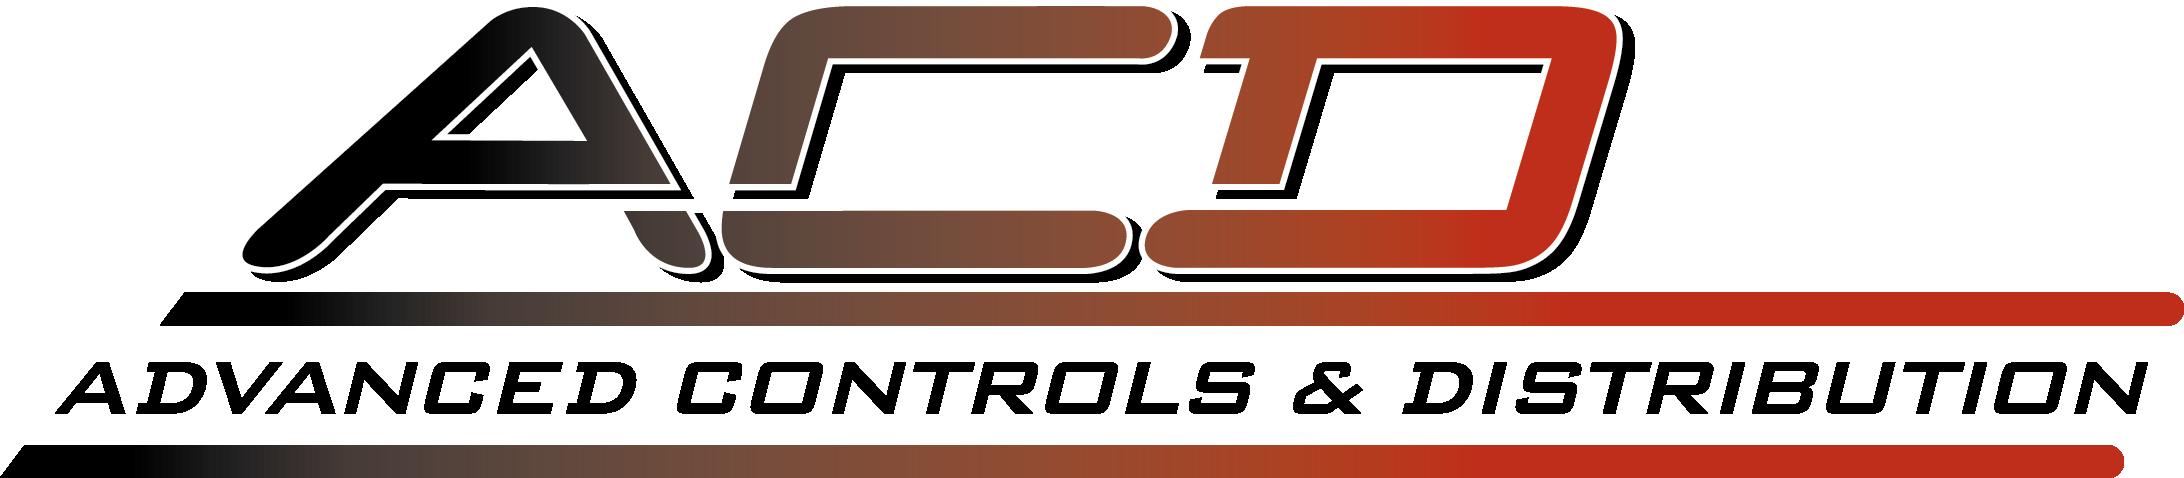 ACD_logo.png